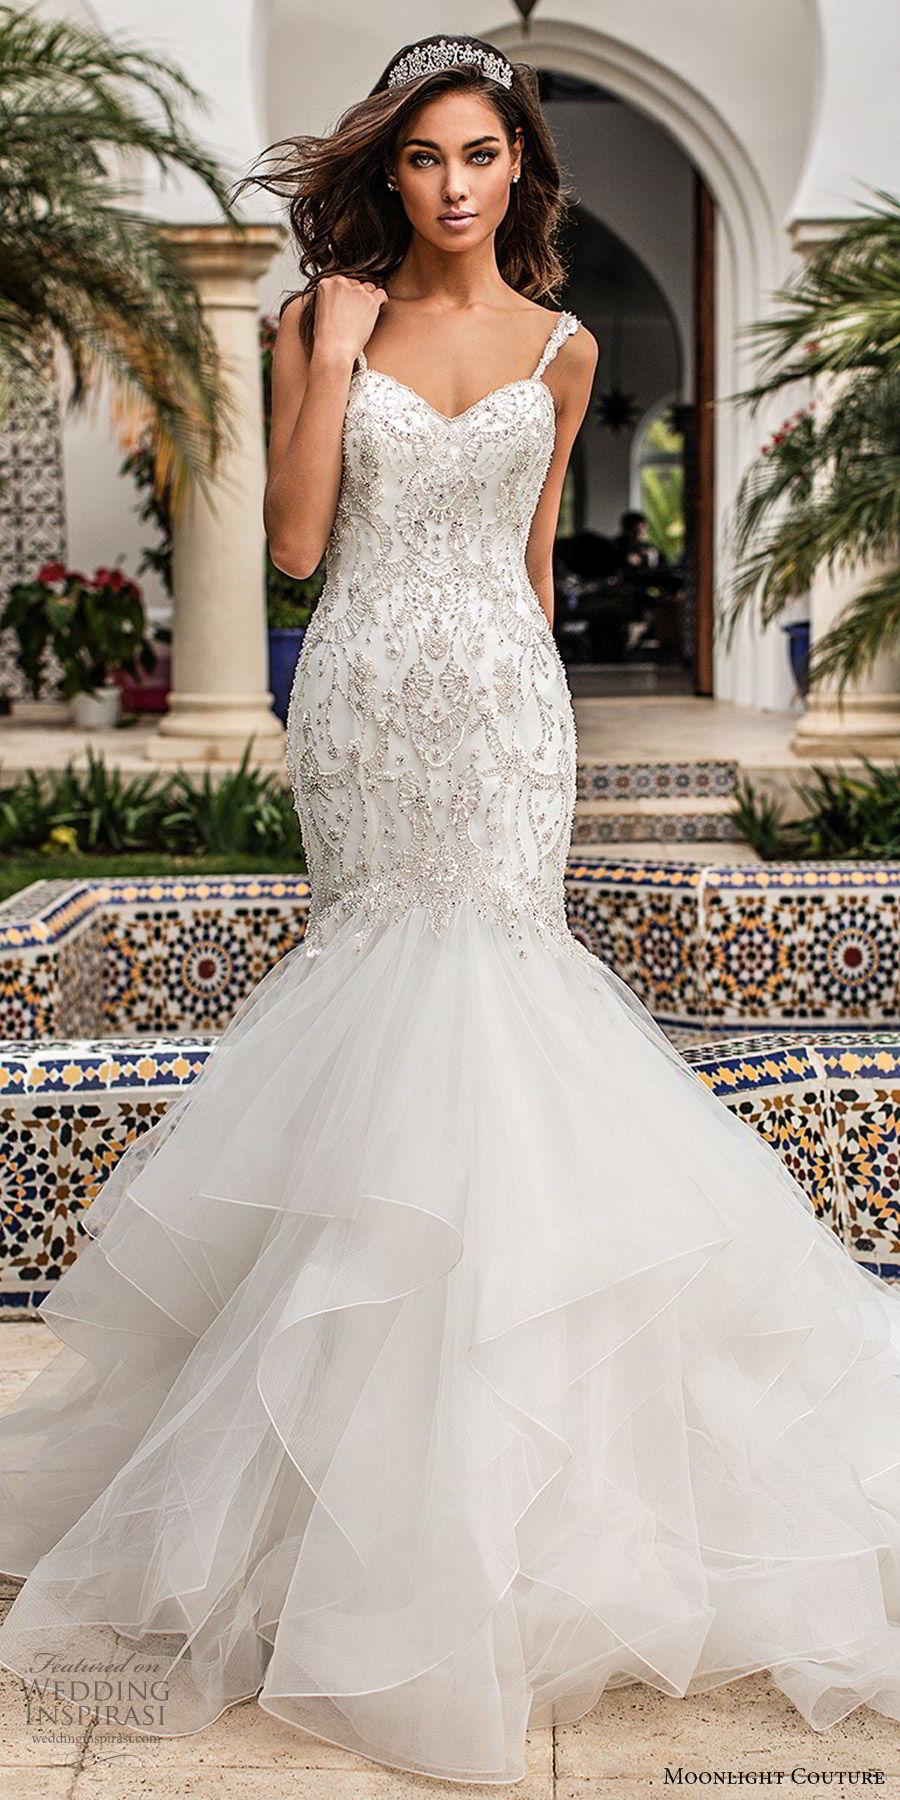 moonlight couture fall 2019 bridal sleeveless beaded sleeves sweetheart embellished bodice ruffle skirt fit flare mermaid wedding dress (11) glitzy elegant romantic chapel train mv